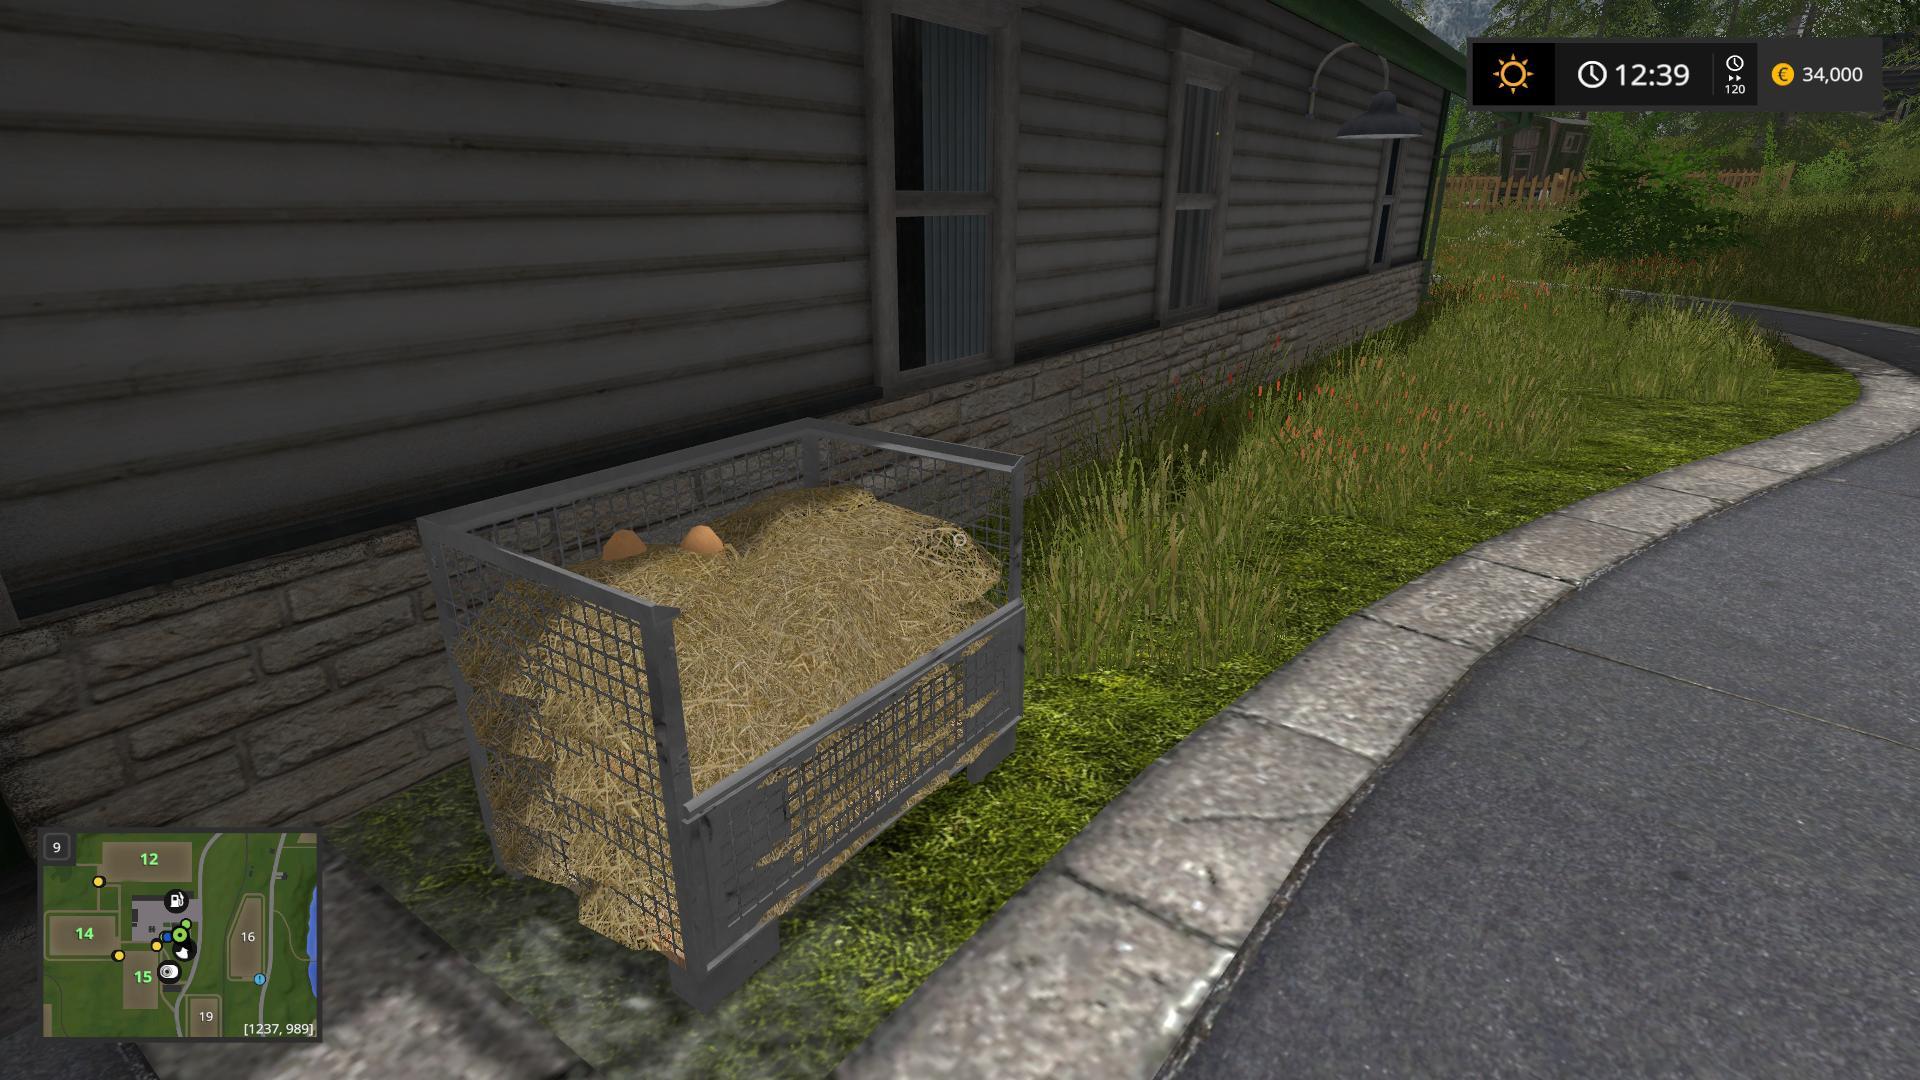 GOLD CREST EDIT BY STEVIE LS2017 - Farming Simulator 17 ...